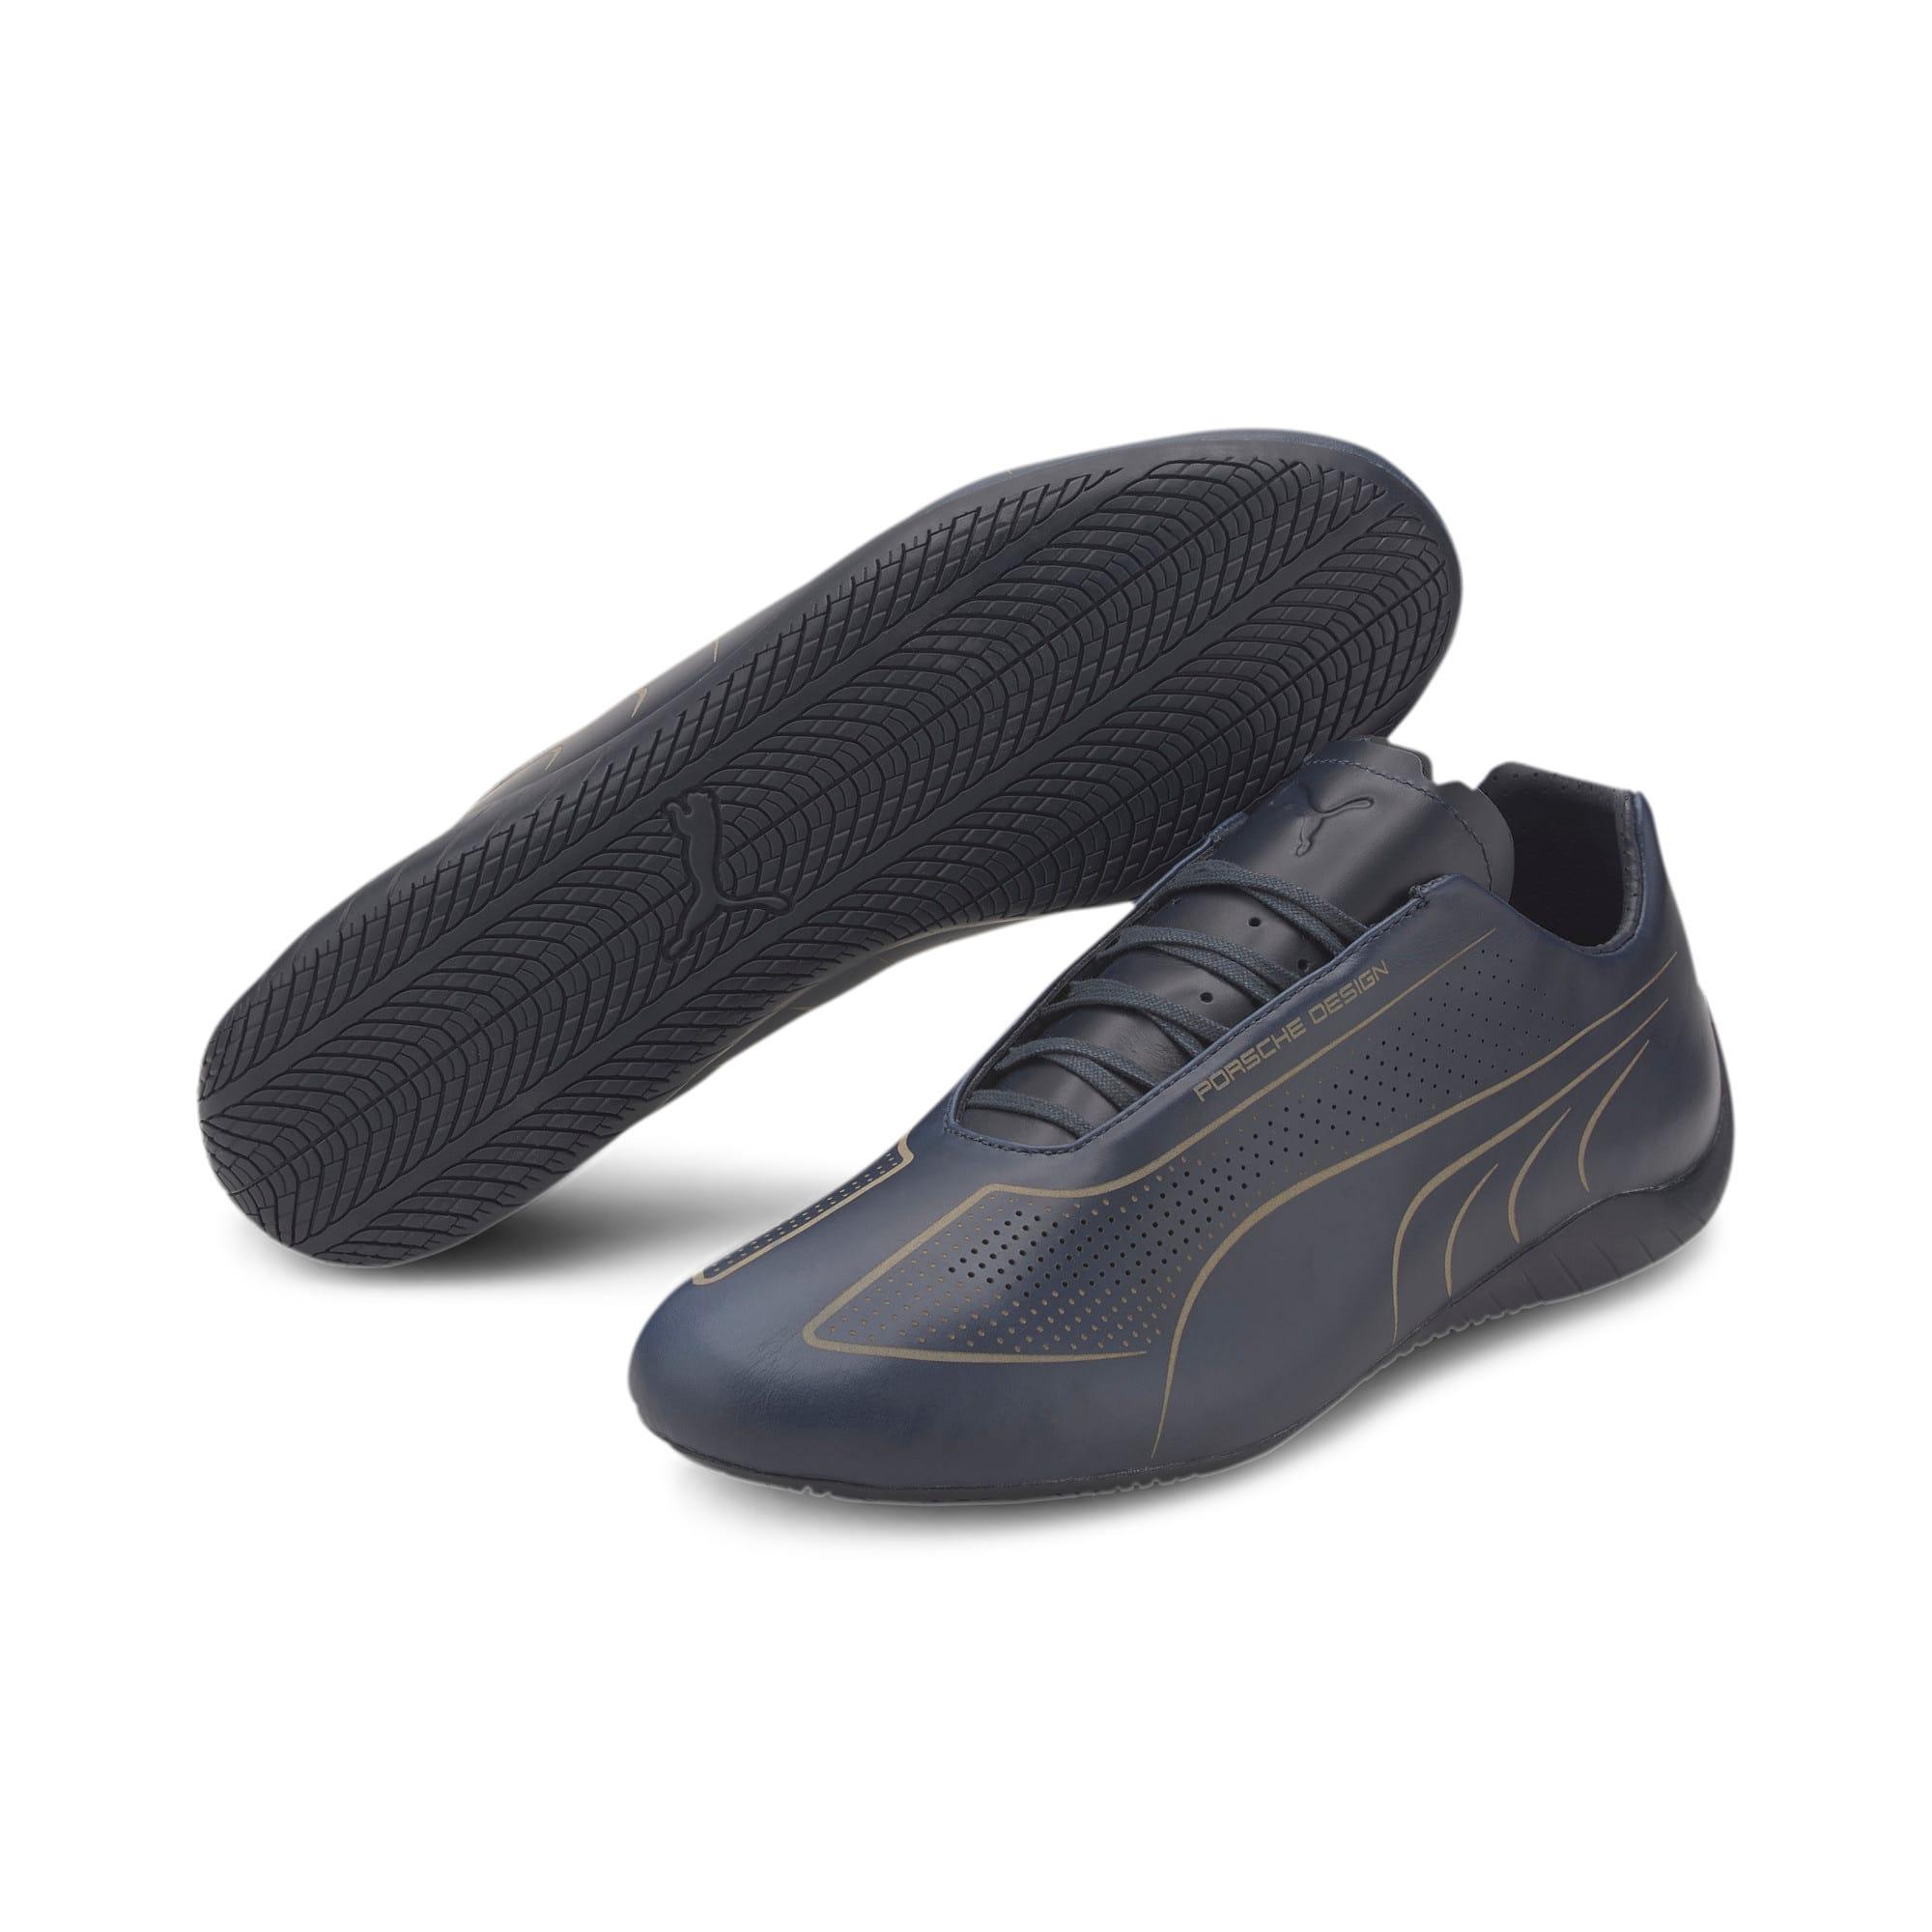 best supplier huge inventory look for Basket Porsche Design SpeedCat Lux pour homme